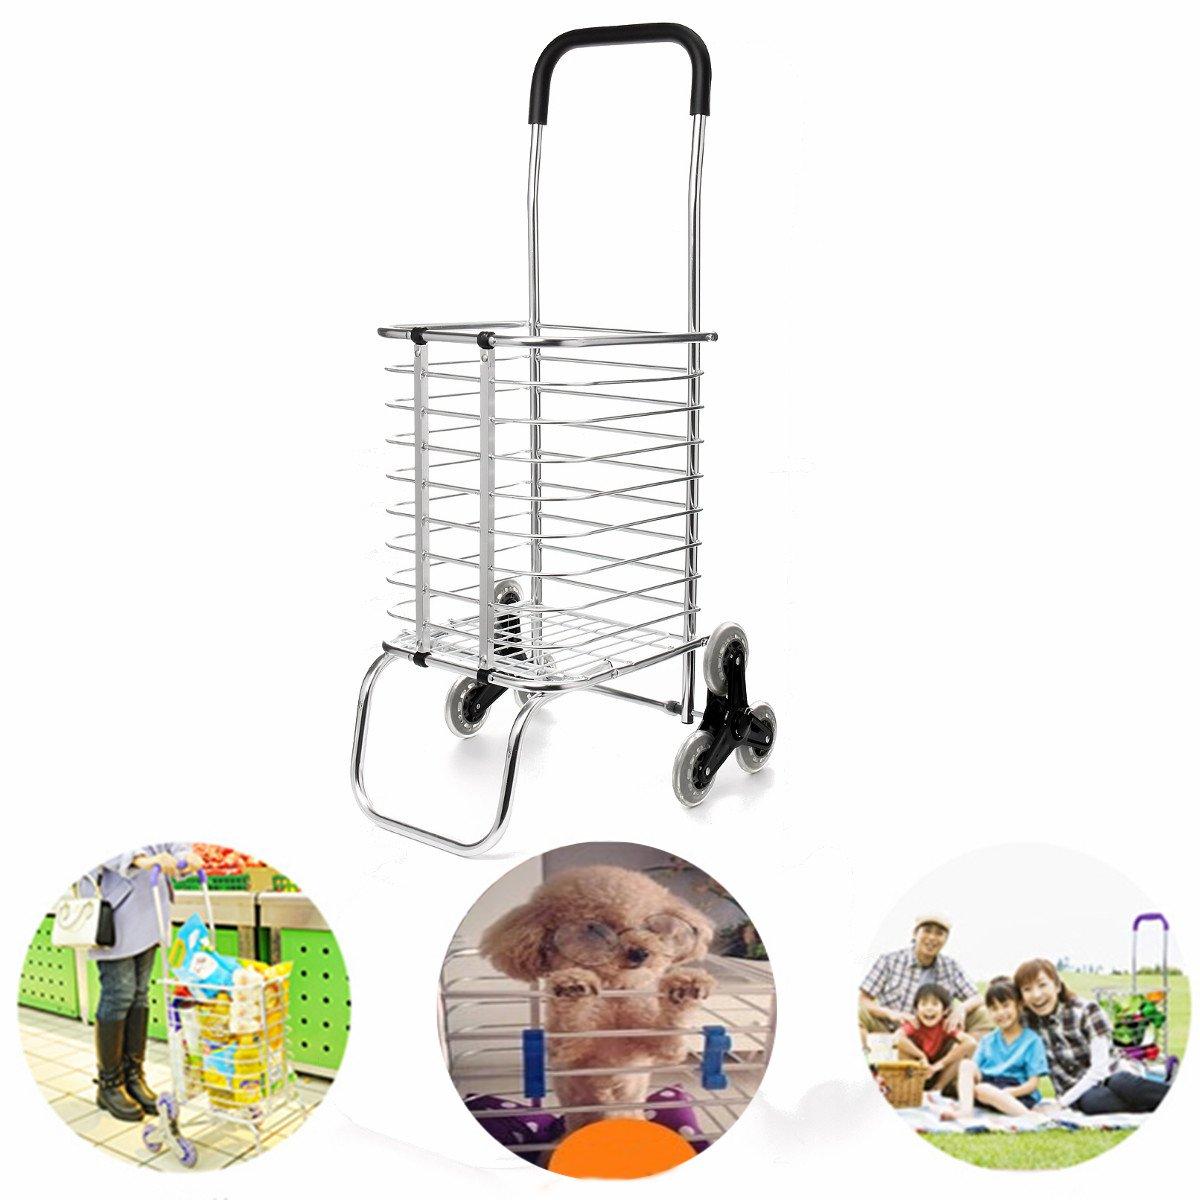 Portable Folding Shopping Cart Hand Cart Basket Bag Luggage Trolley Climb Stairs 6 Wheels Aluminum Alloy